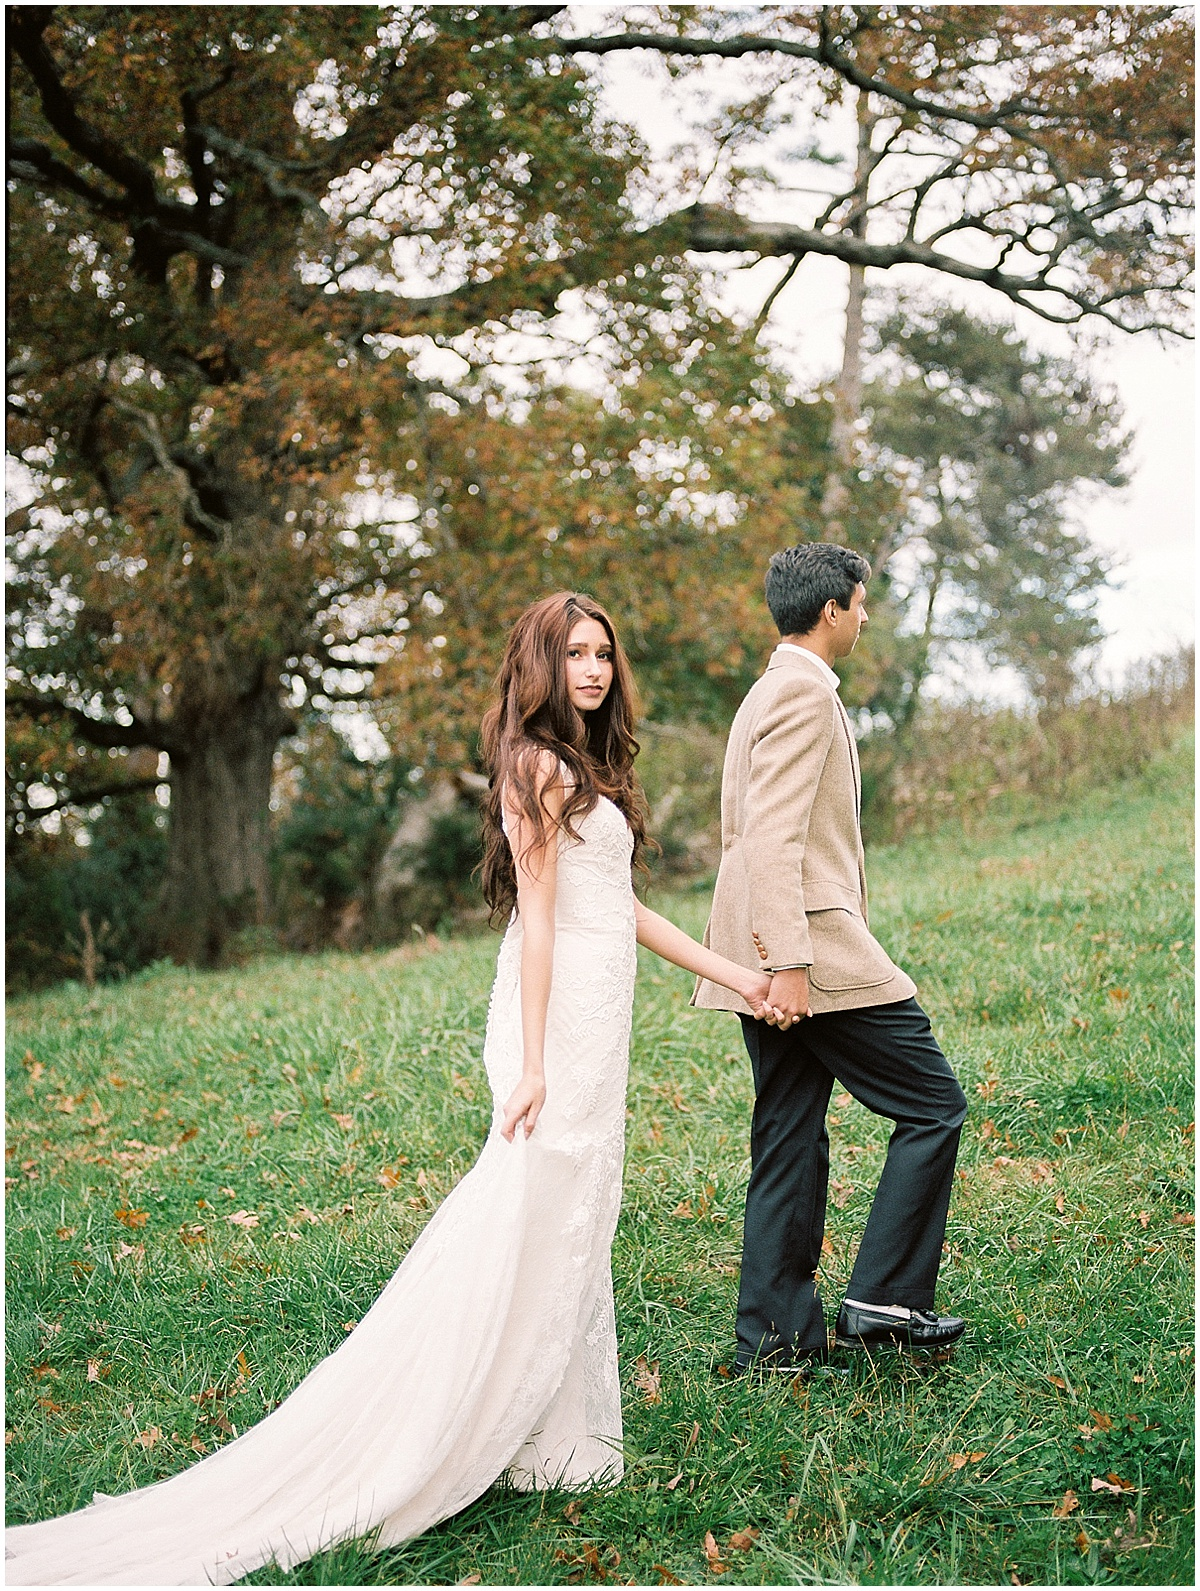 Abigail_Malone_Fall_Wedding_Knoxville_Film_Portra_400_Kodak_Mountain_Views_Abby_Elizabeth-57.jpg